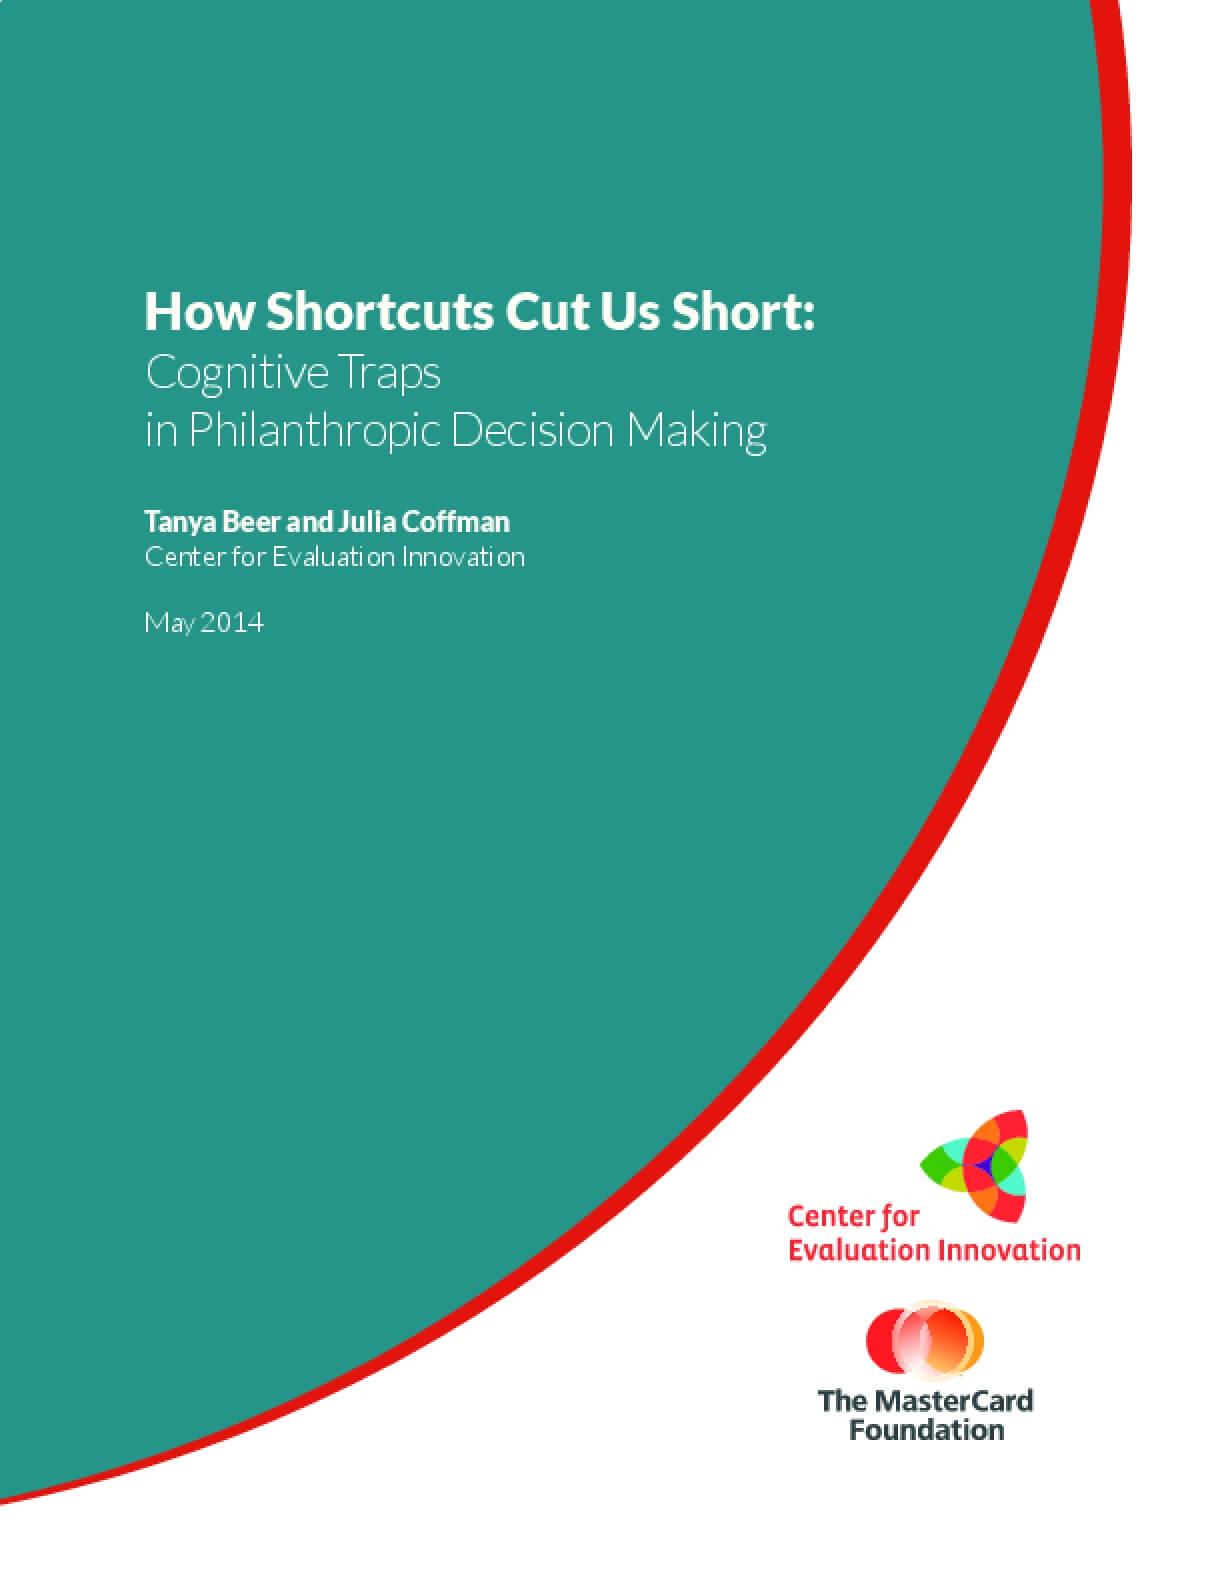 How Shortcuts Cut Us Short: Cognitive Traps in Philanthropic Decision Making